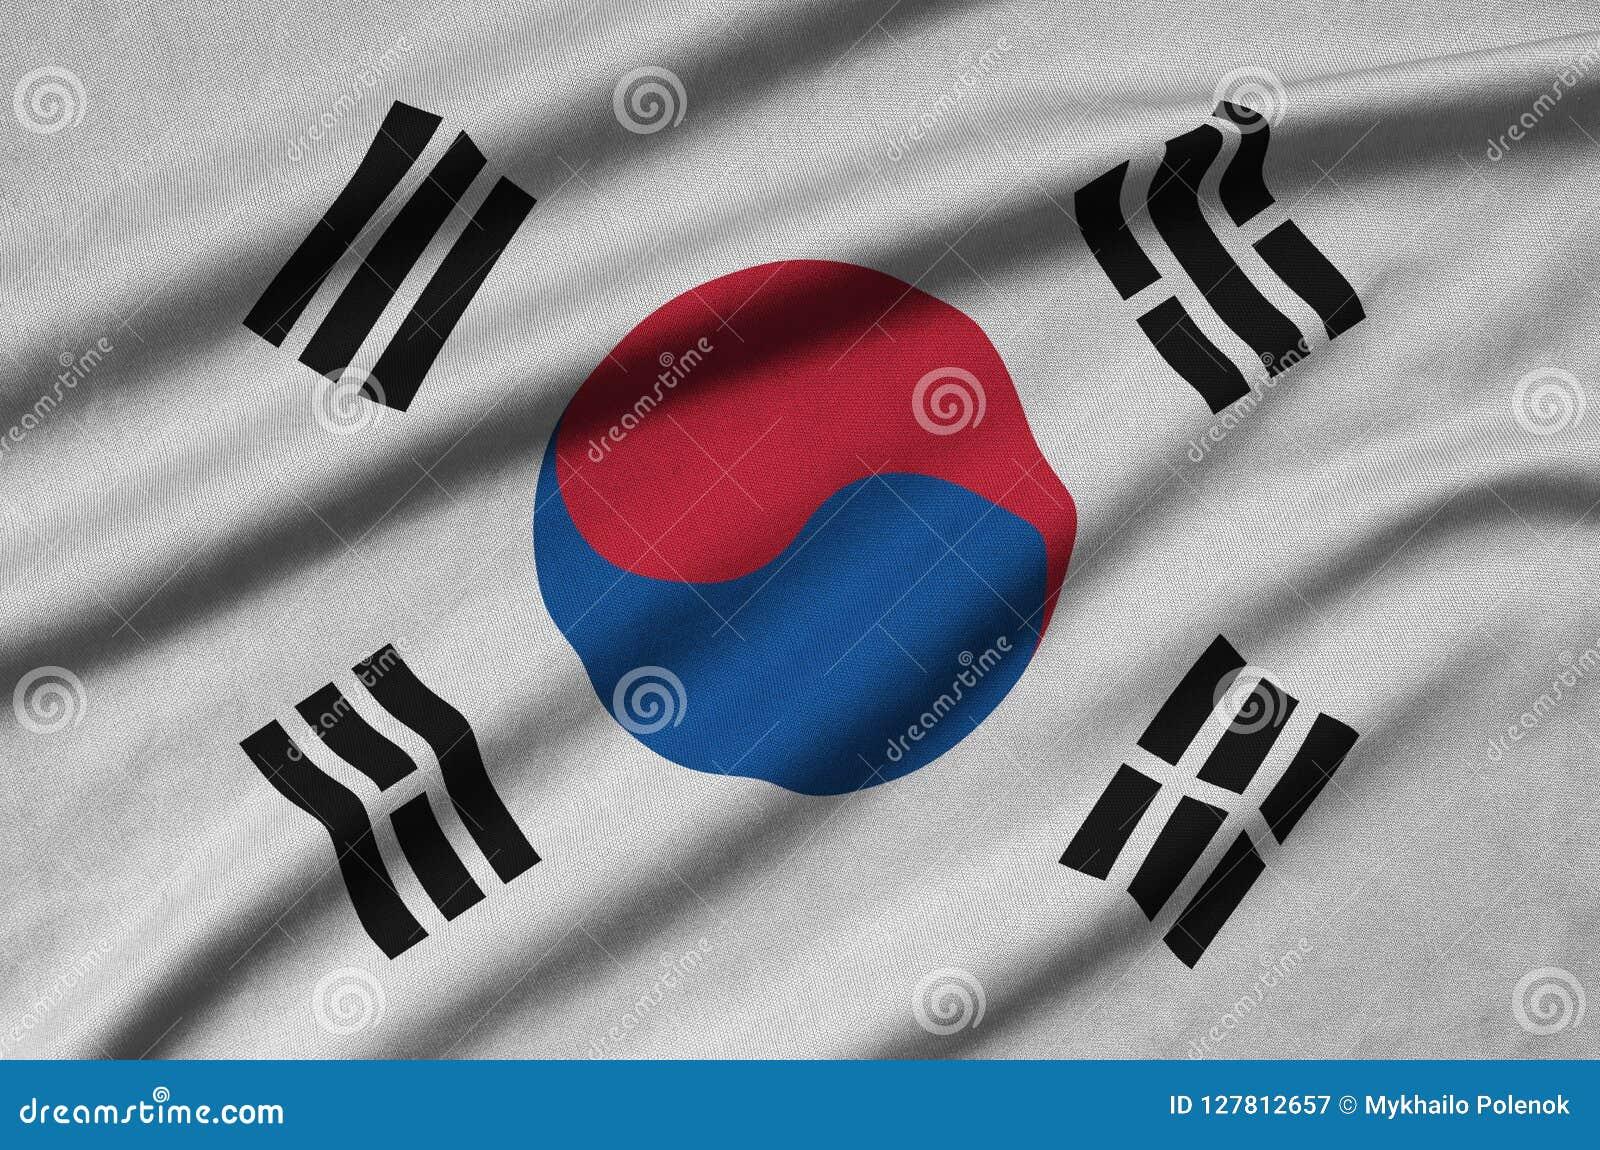 Флаг Южной Кореи показан на ткани ткани спорт с много створок Знамя команды спорта